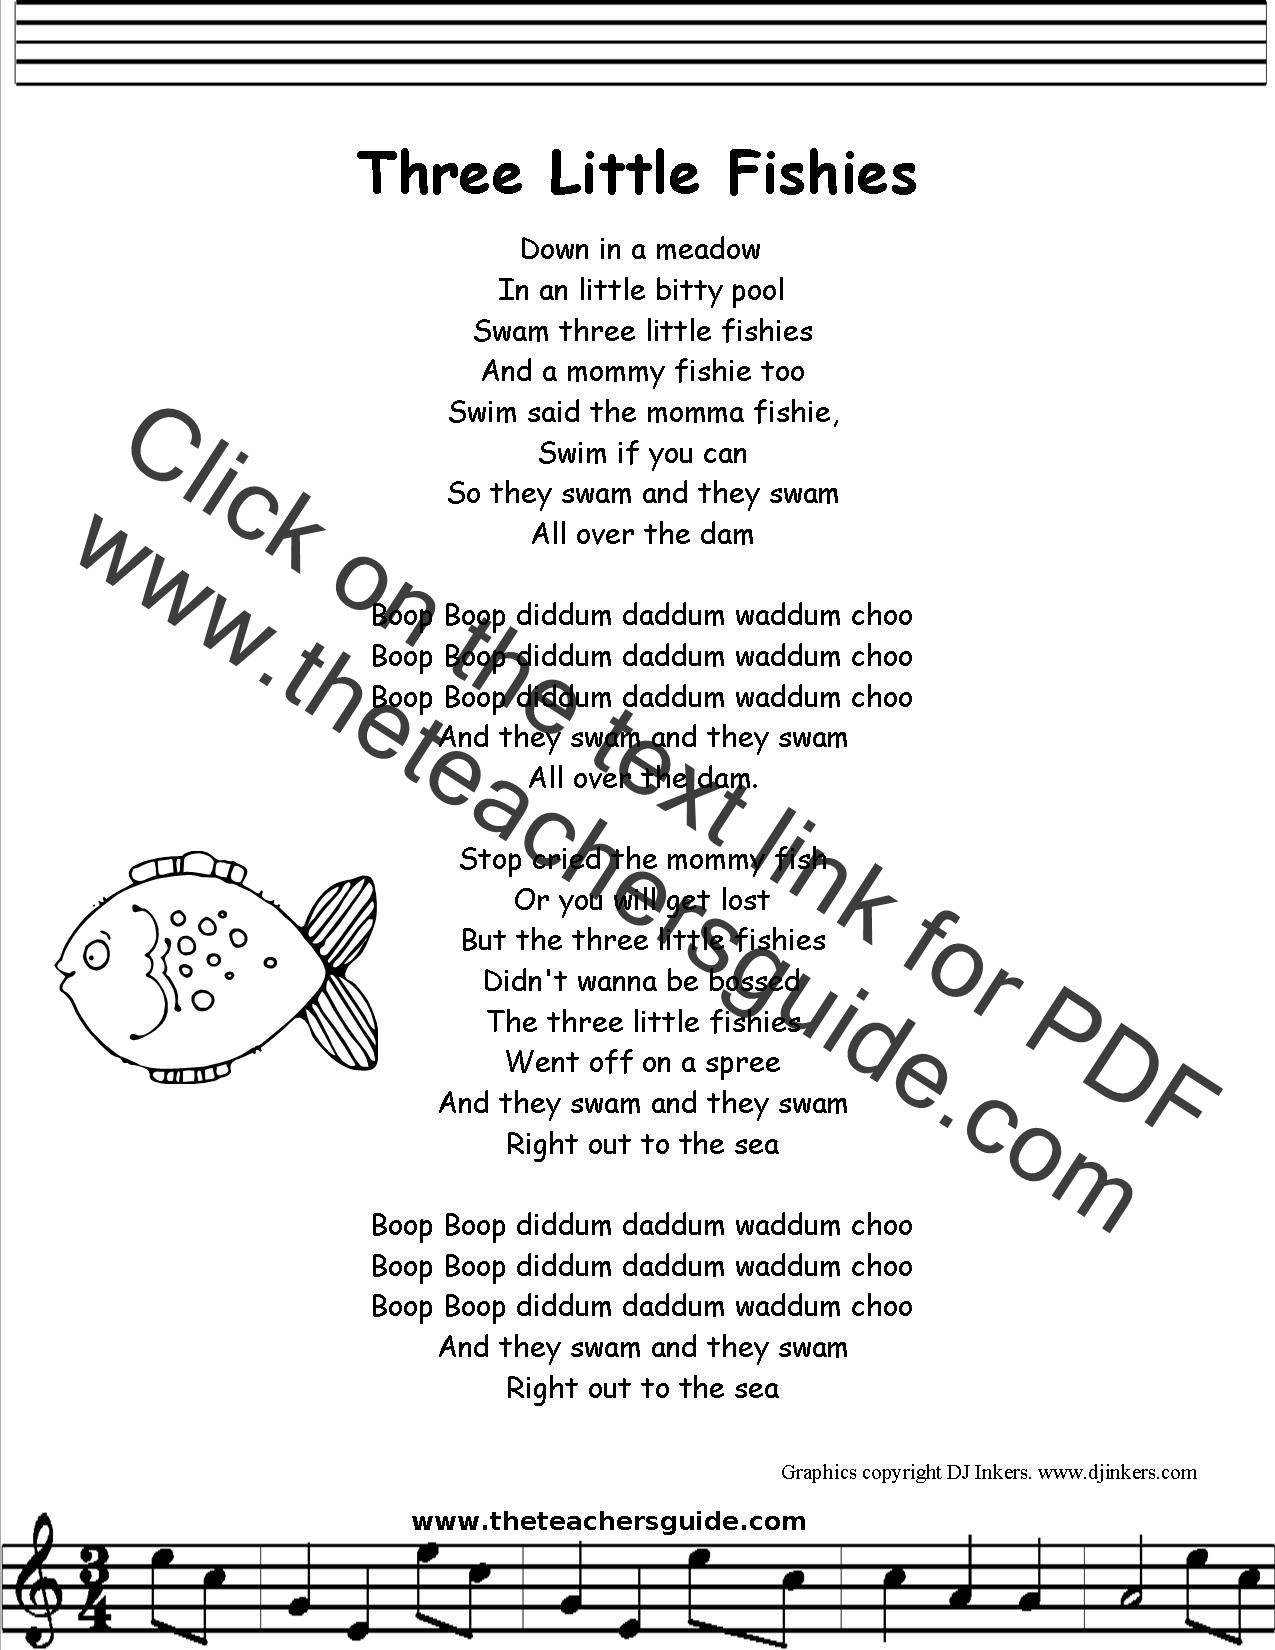 Three Little Fishies Lyrics Printout Midi And Video